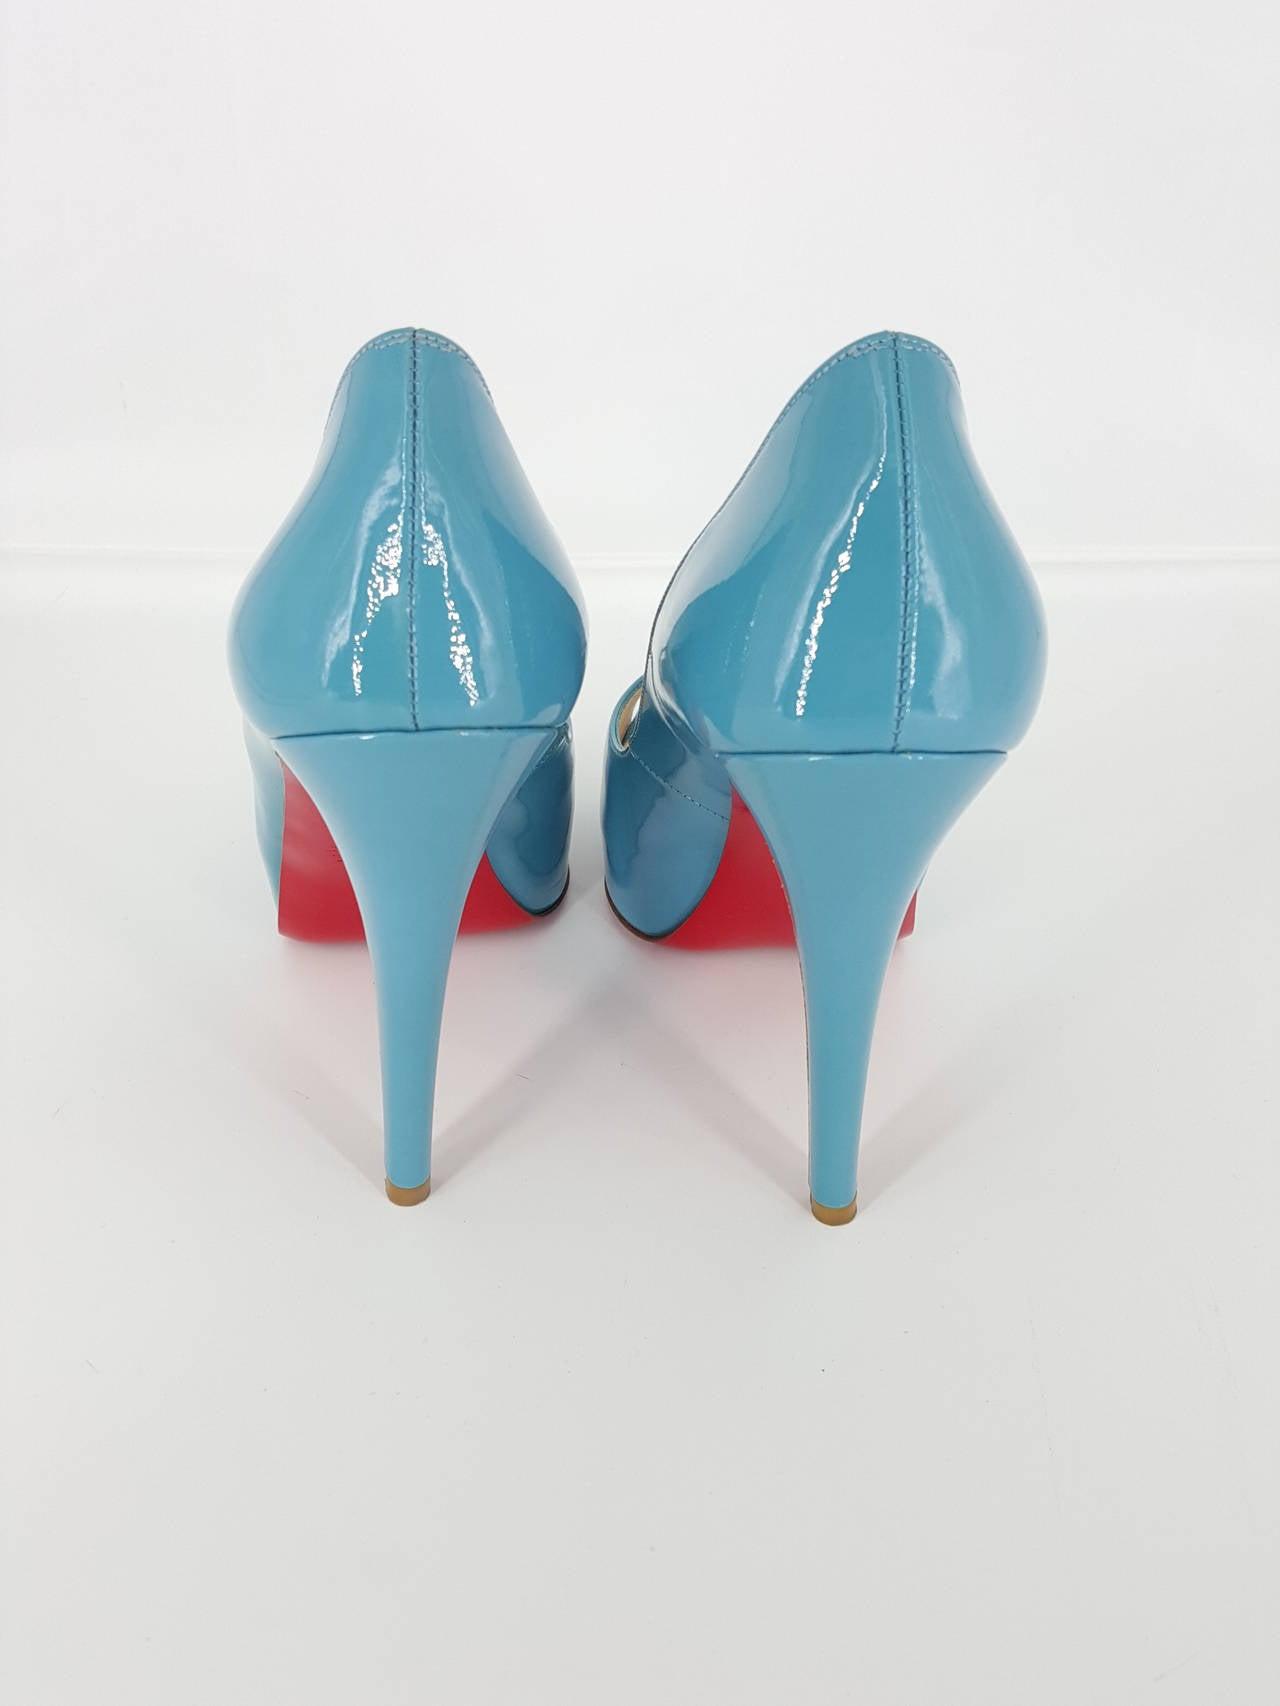 "Christian Louboutin Turquoise Patent Leather Peep Toe Pumps.  Size 36 1/2"" 3"